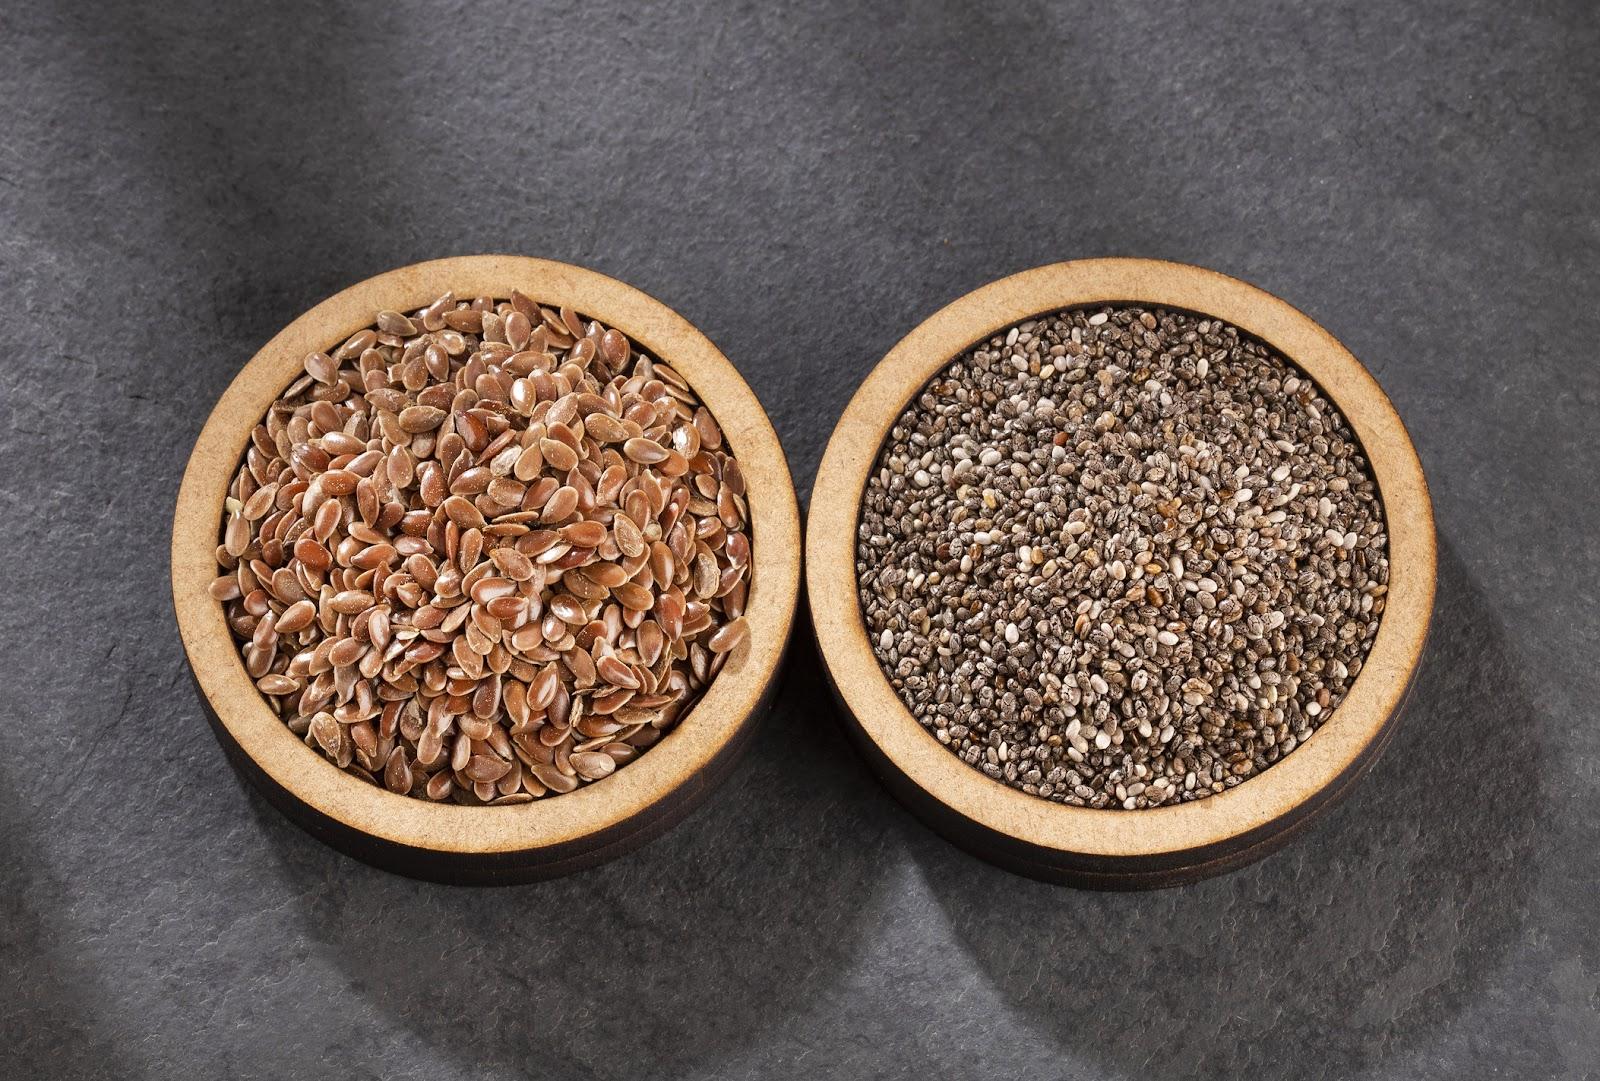 Flax & Chia Seeds